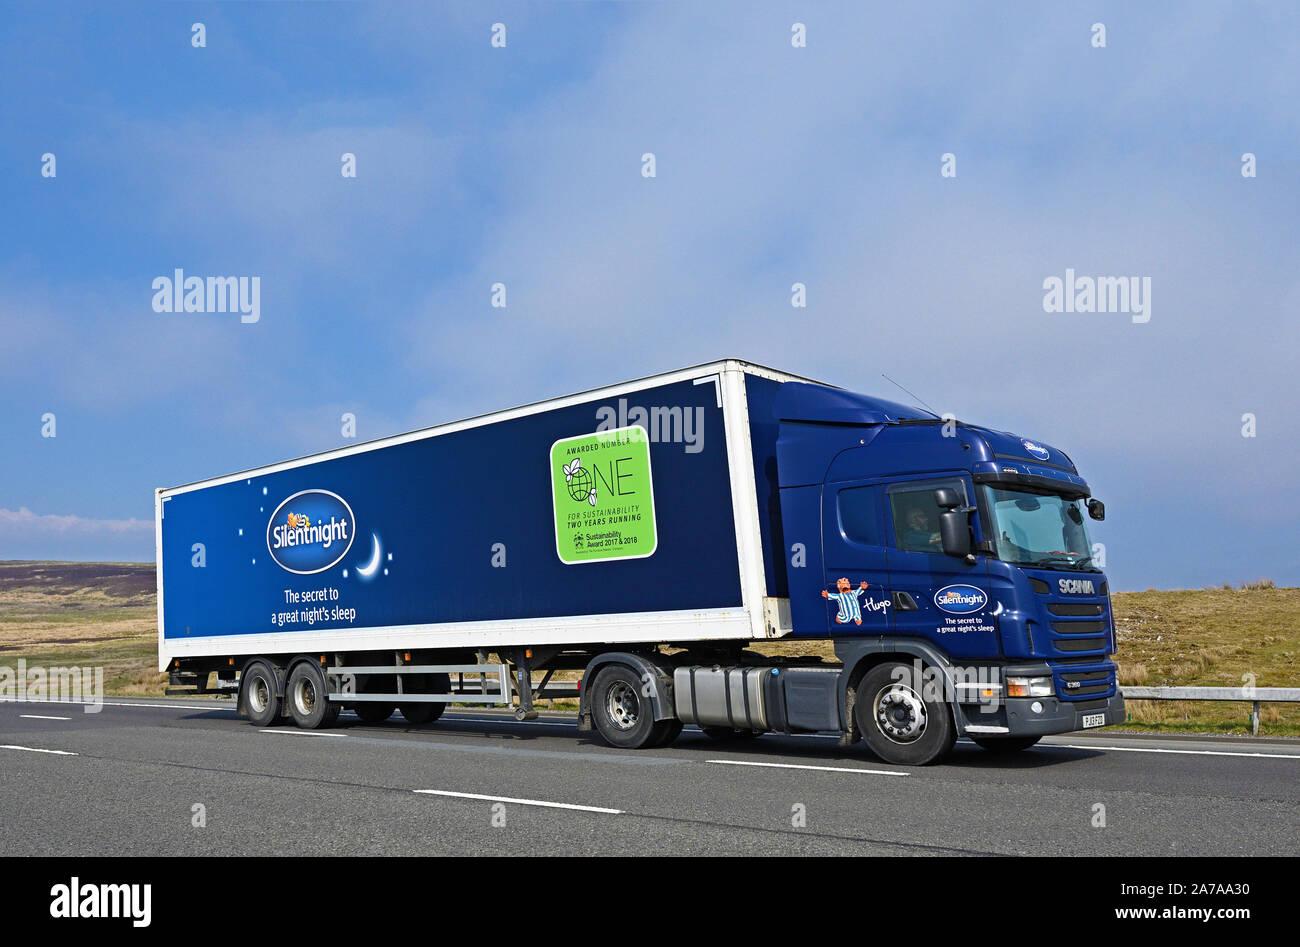 silentnight-hgv-m6-motorway-southbound-shap-cumbria-england-united-kingdom-europe-2A7AA30.jpg